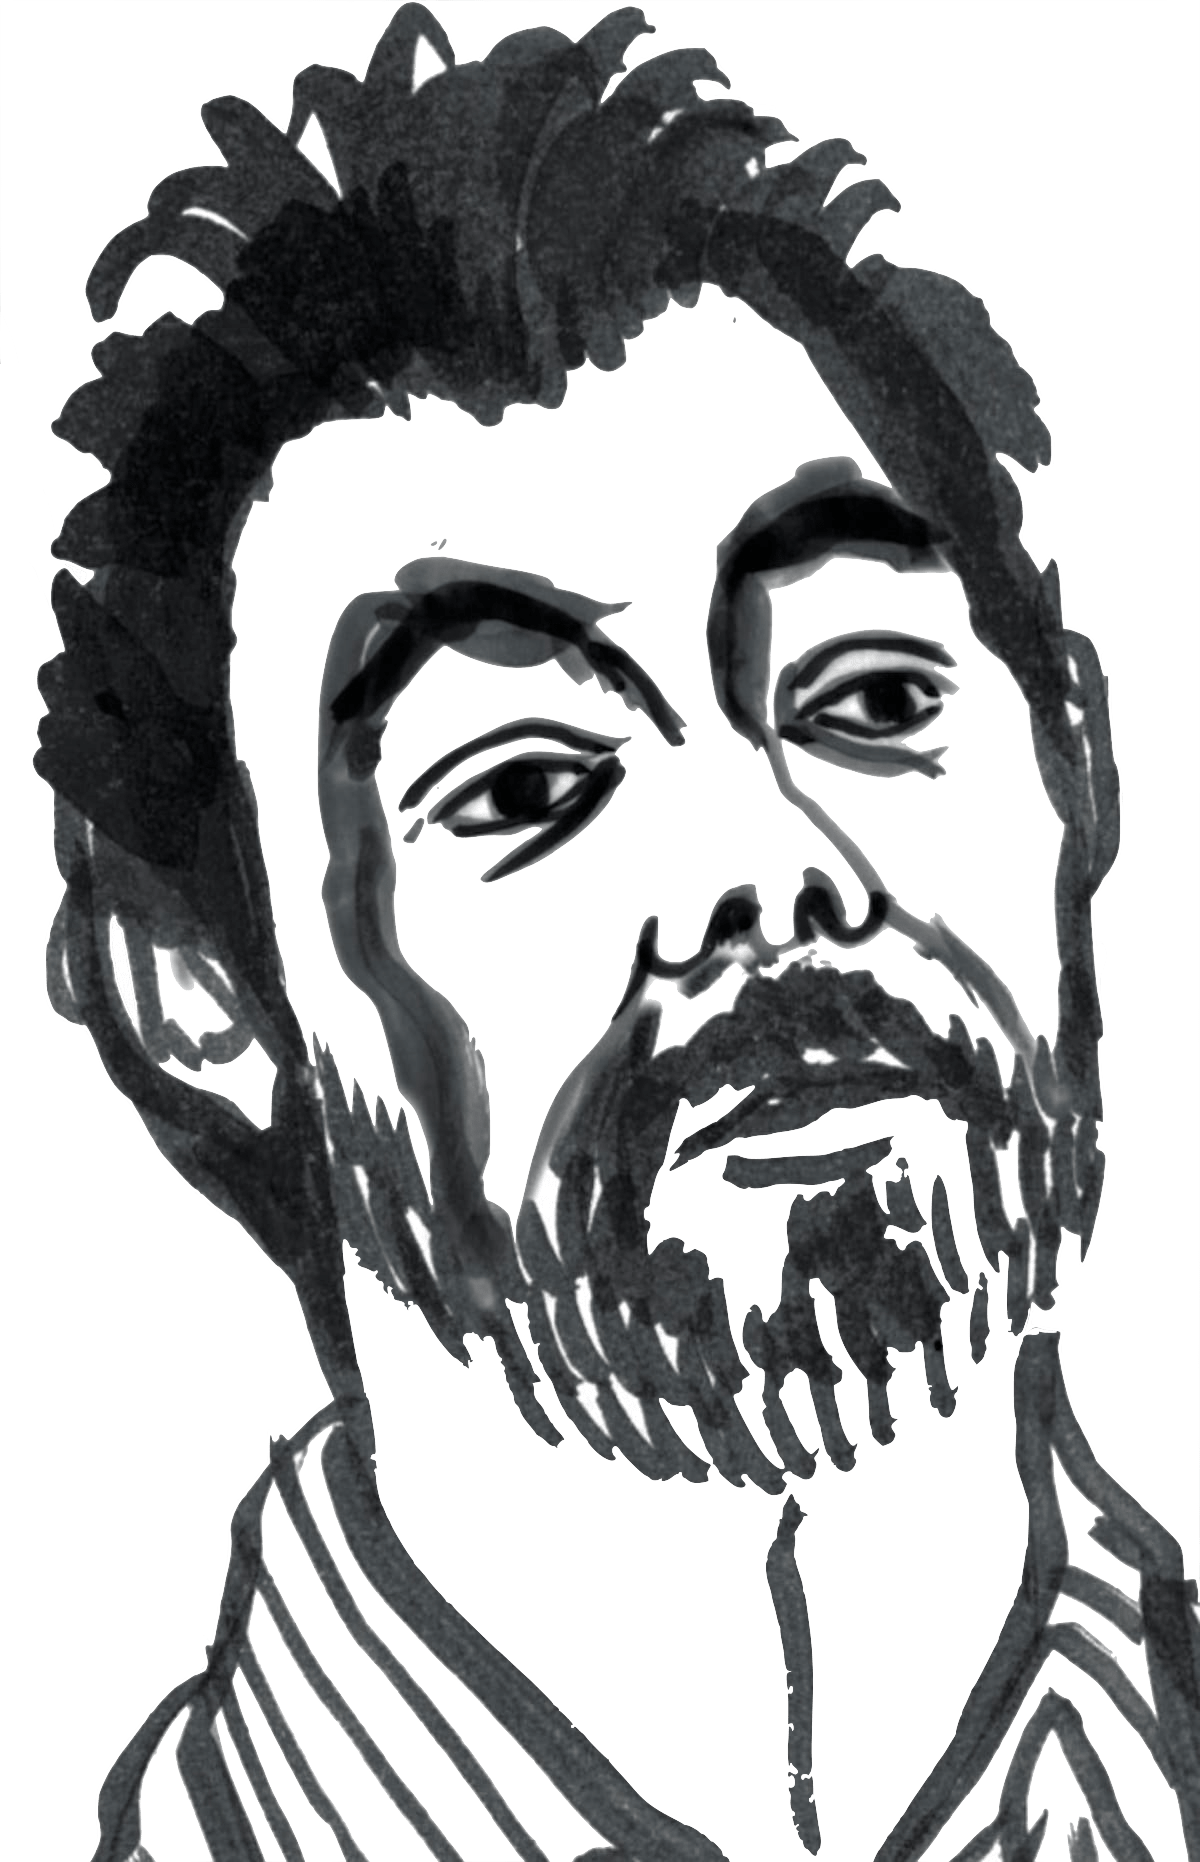 Anselm Jappe